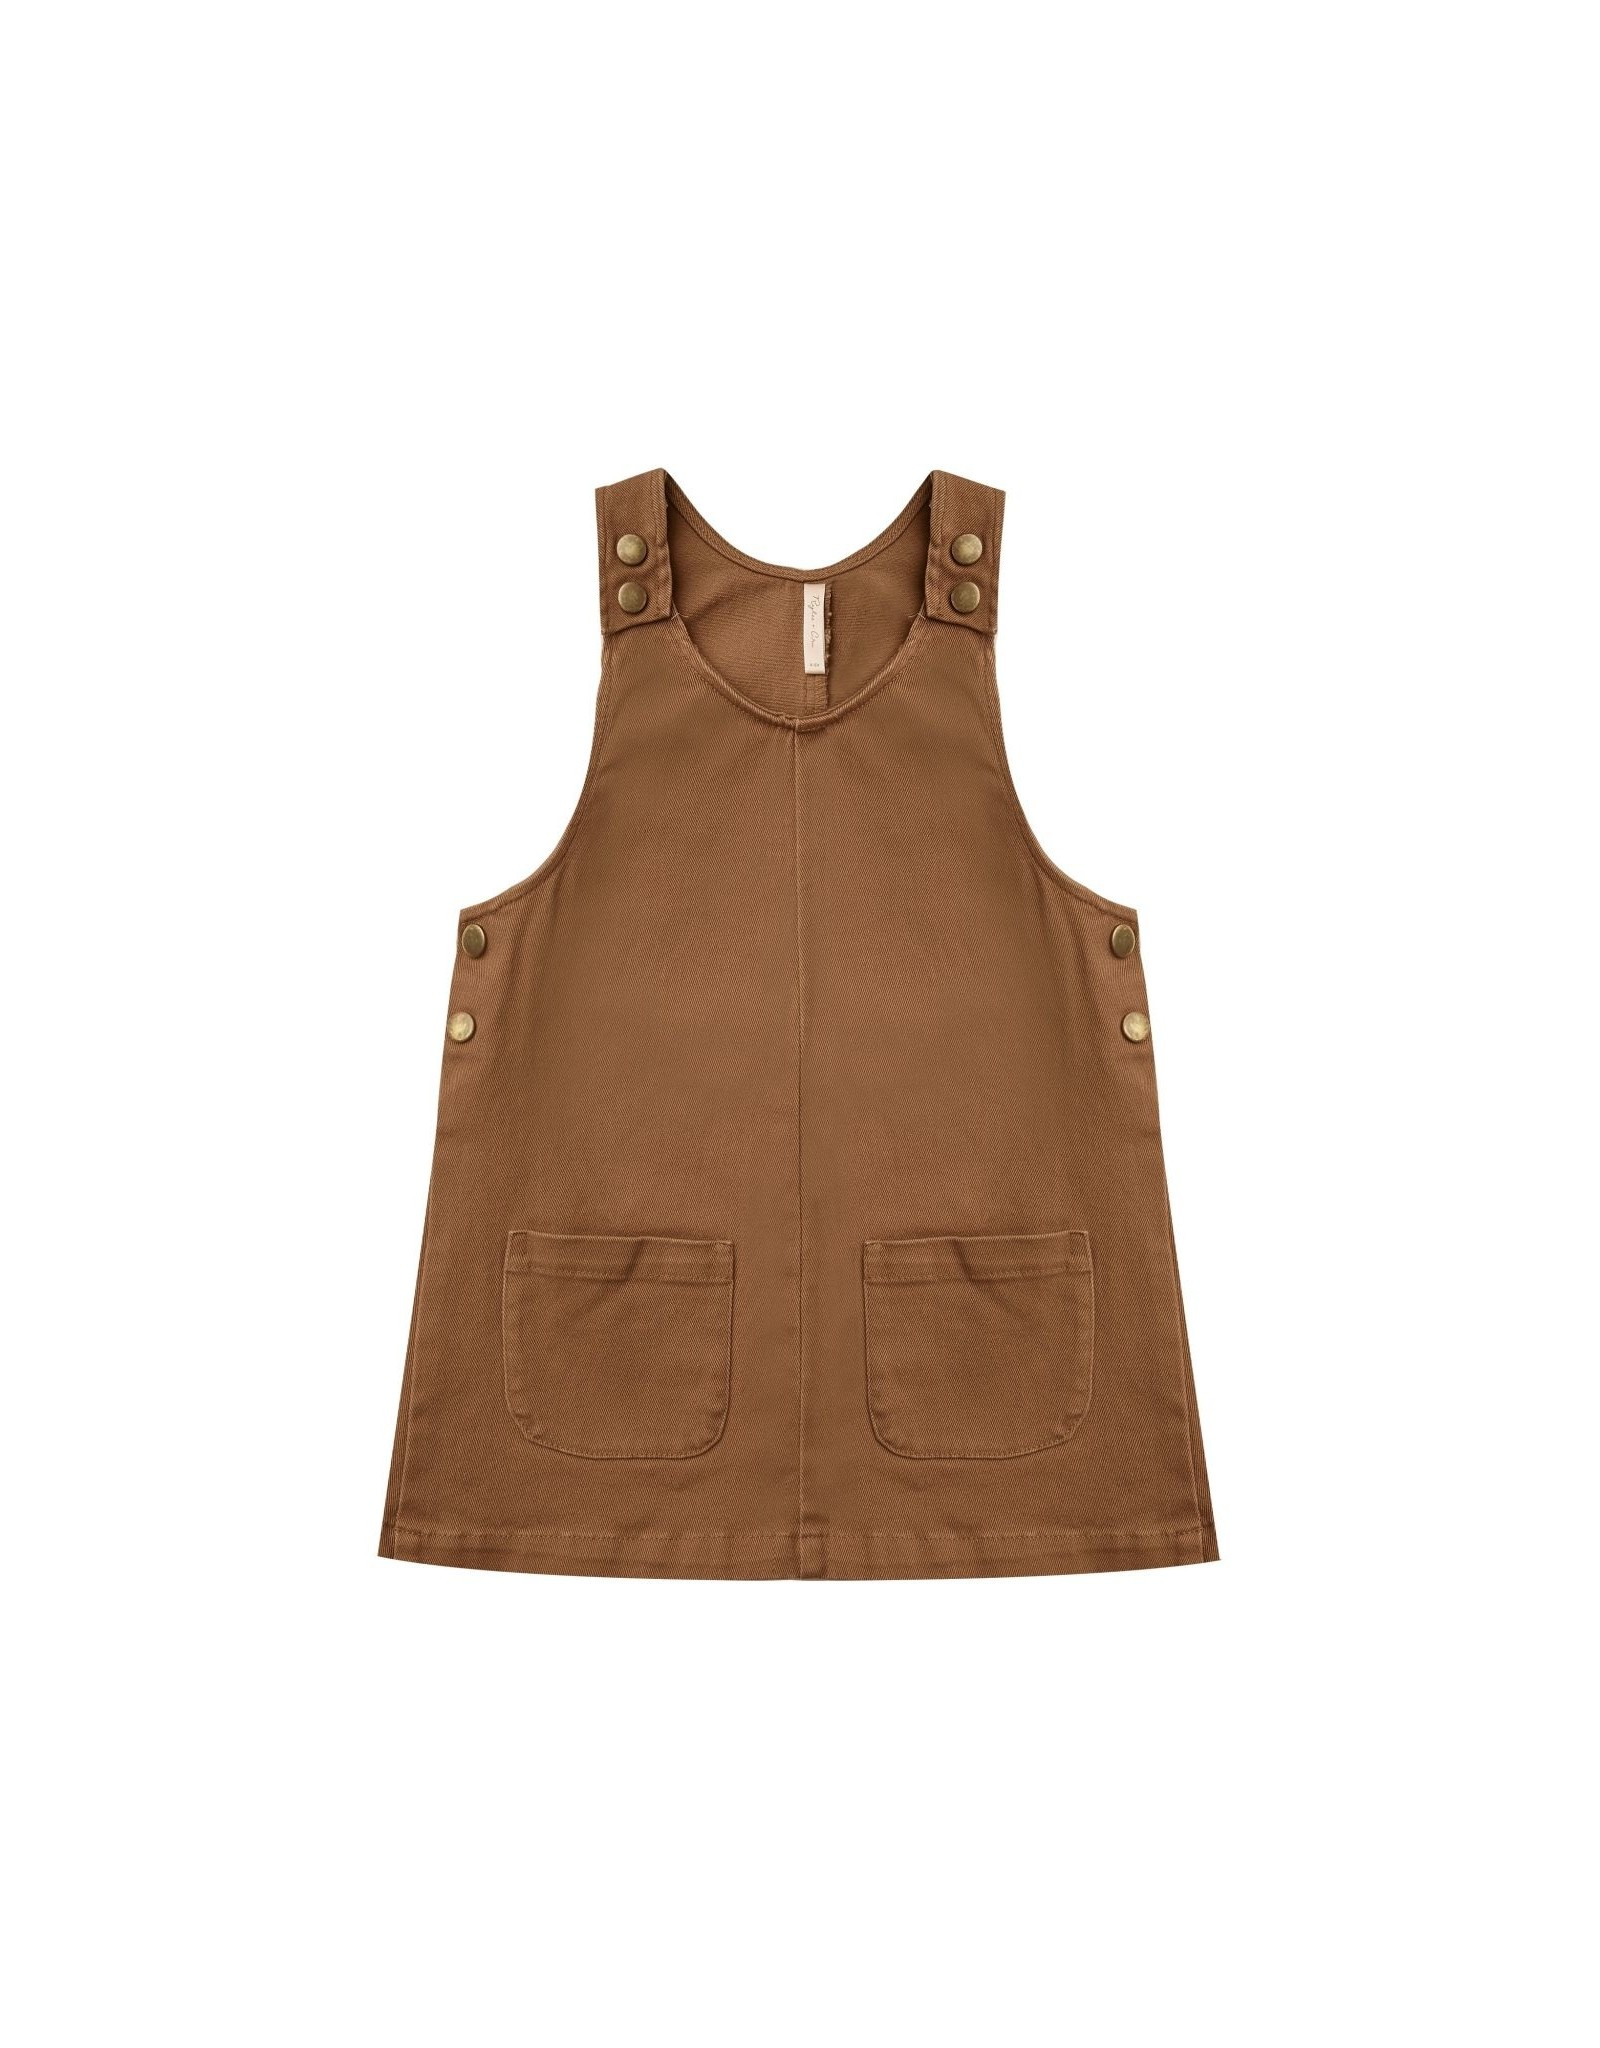 Rylee and Cru odette dress- rust